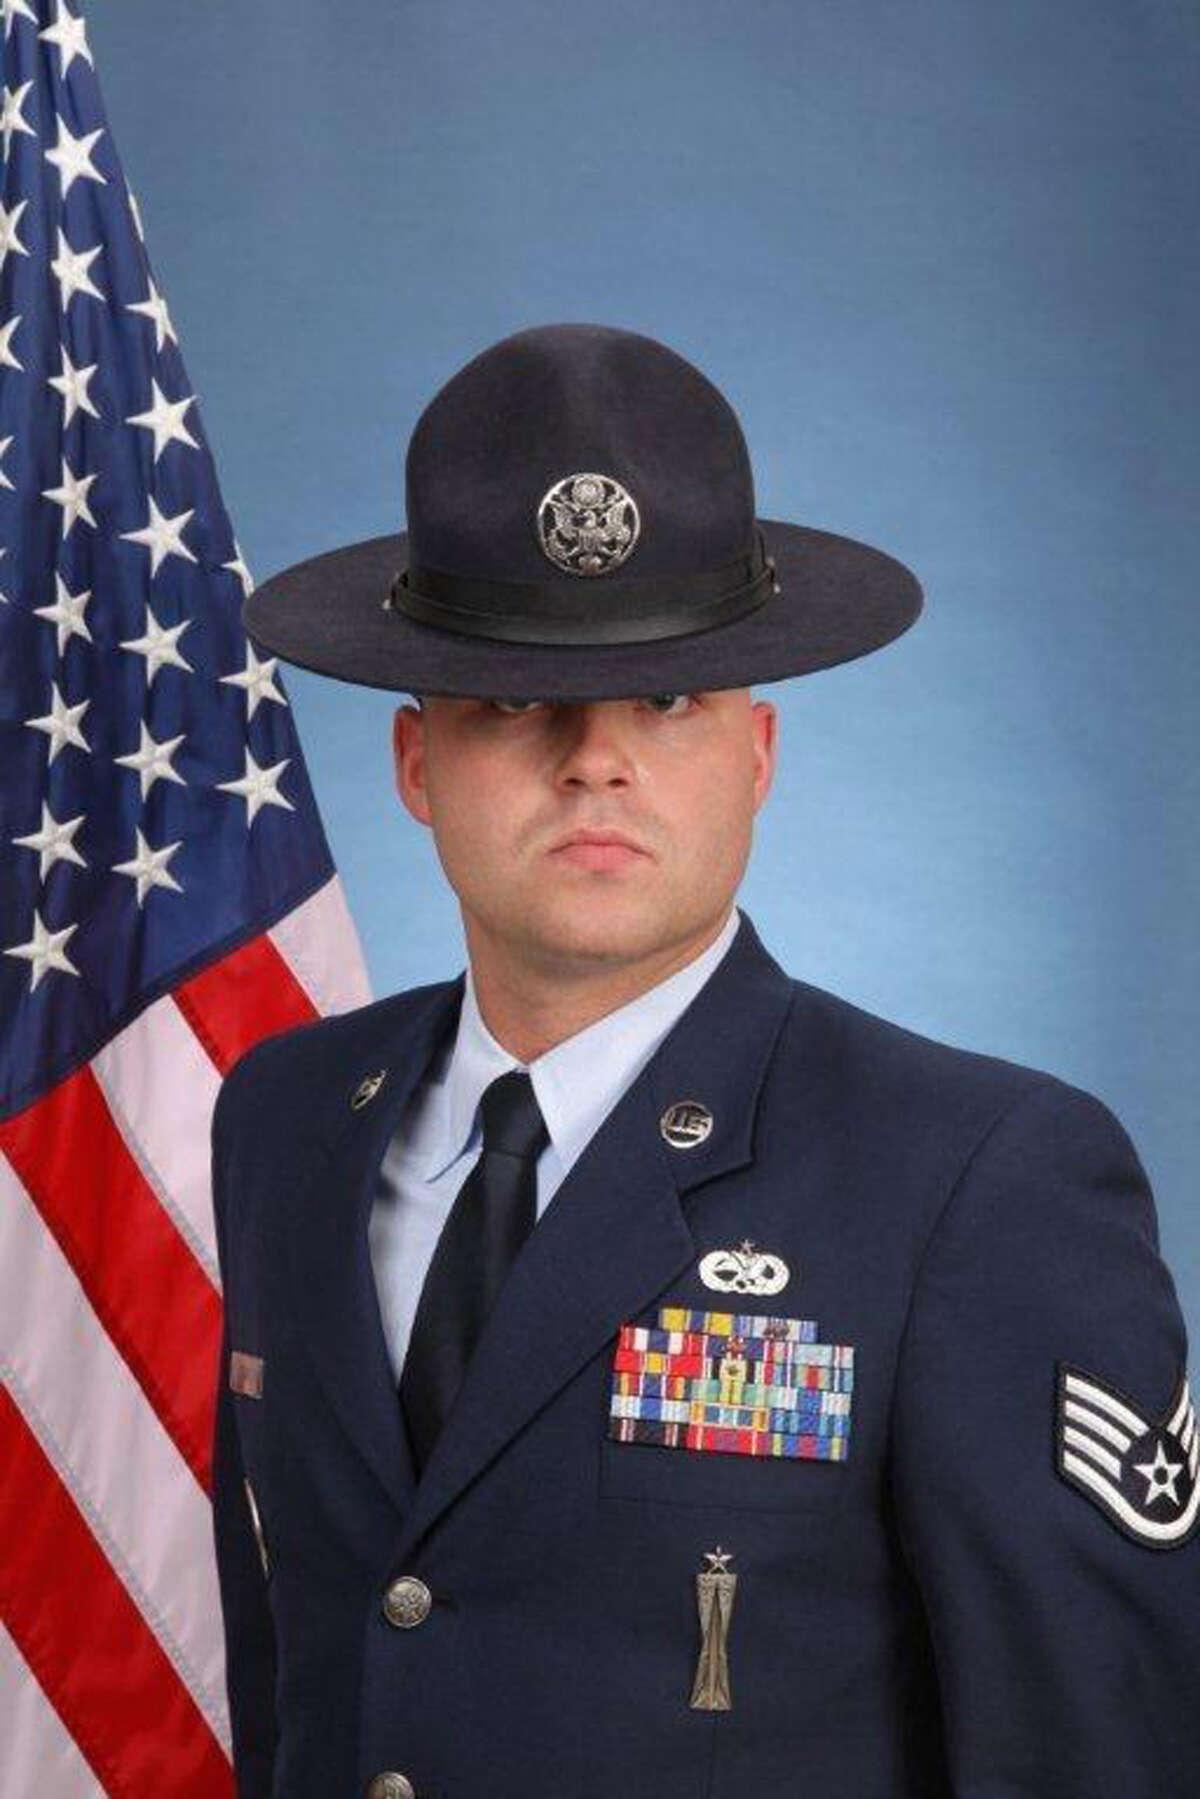 Staff Sgt. Ryan Deraas